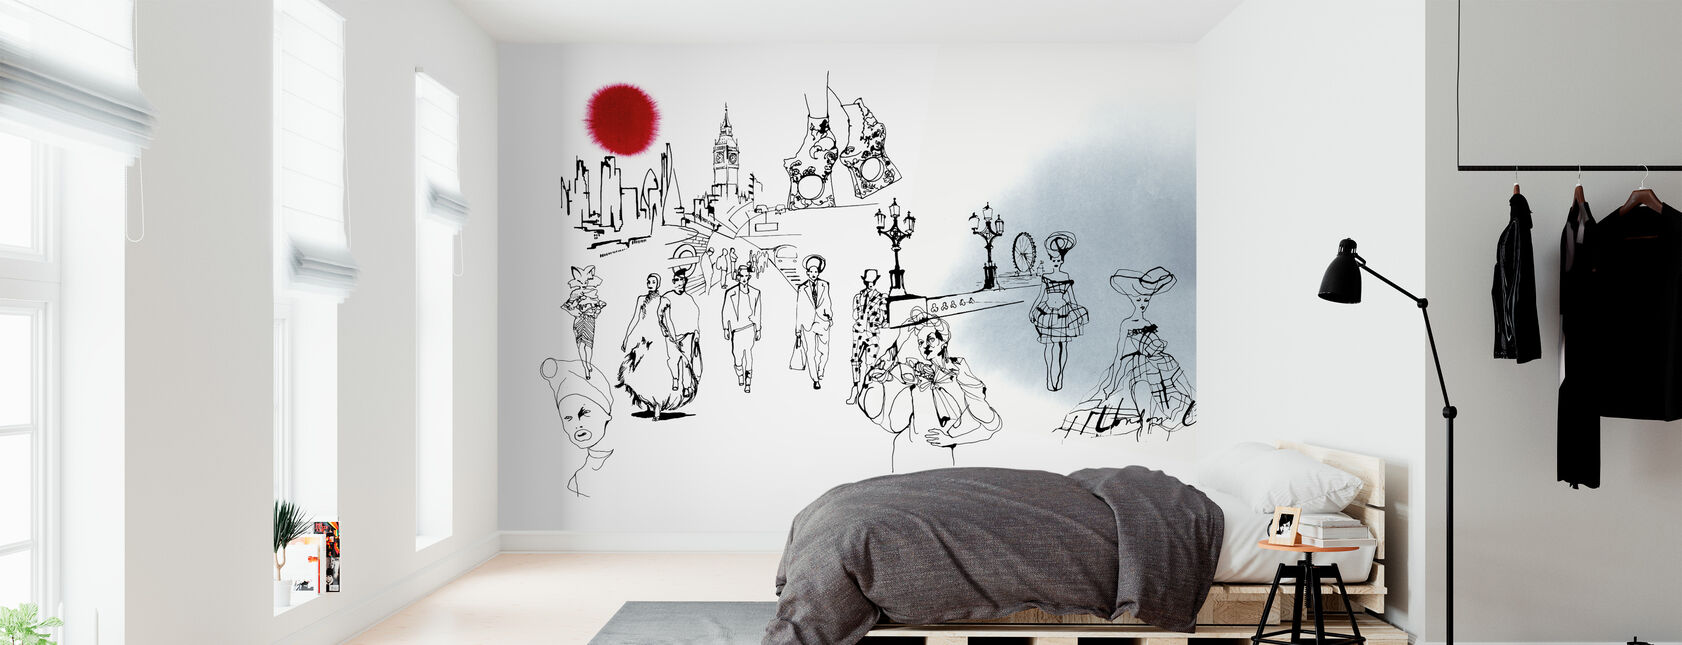 The London Edition - Wallpaper - Bedroom